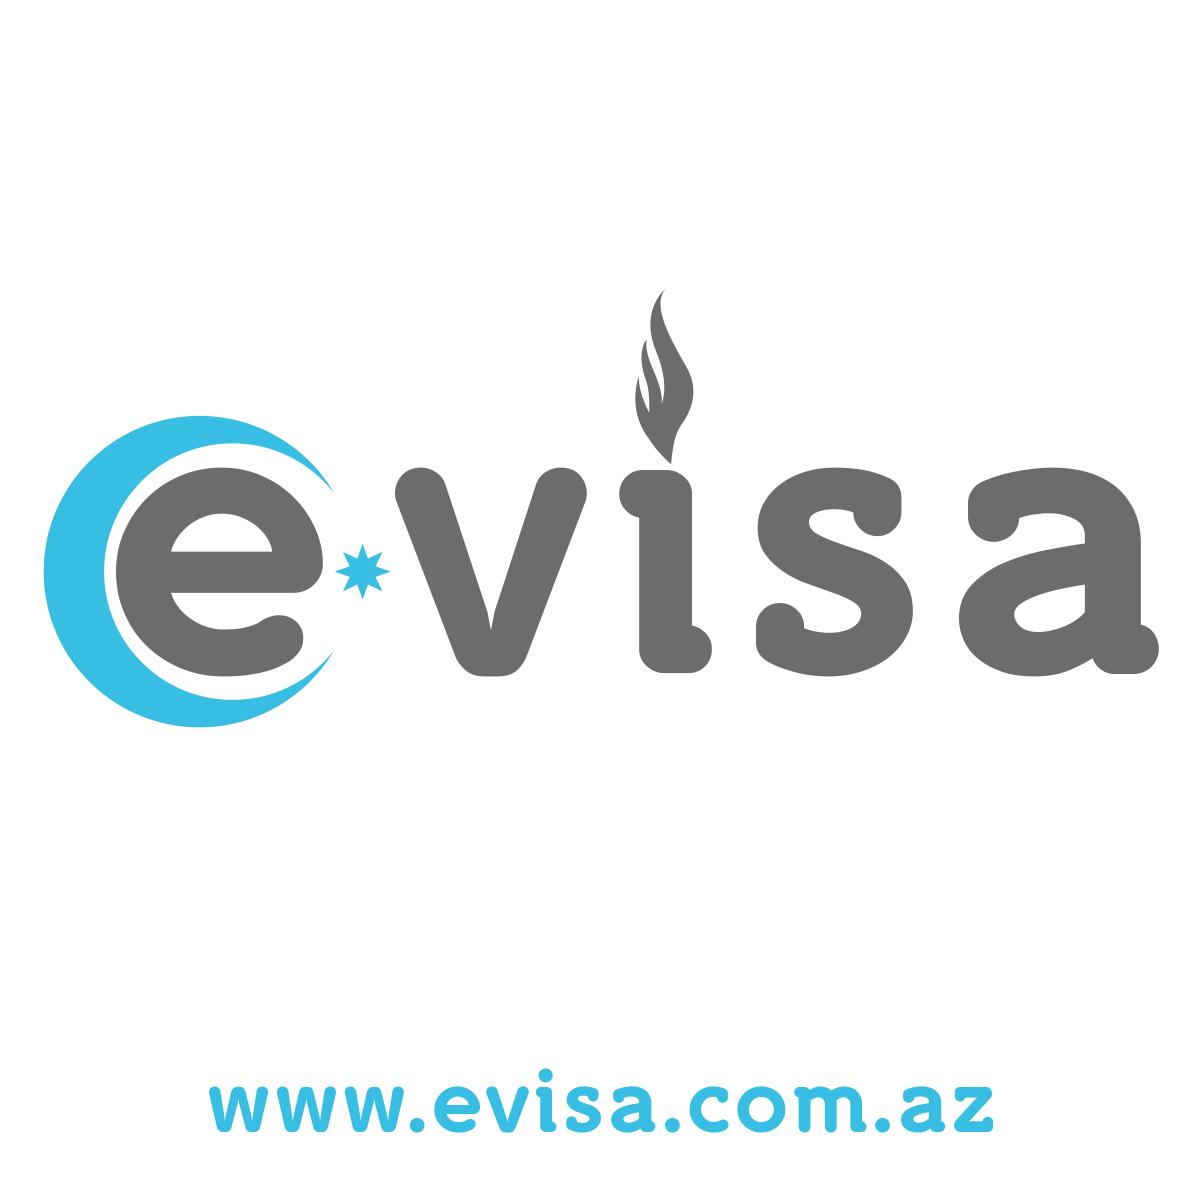 Evisa Azerbaijan Republic Of Azerbaijan Electronic Visa Application System